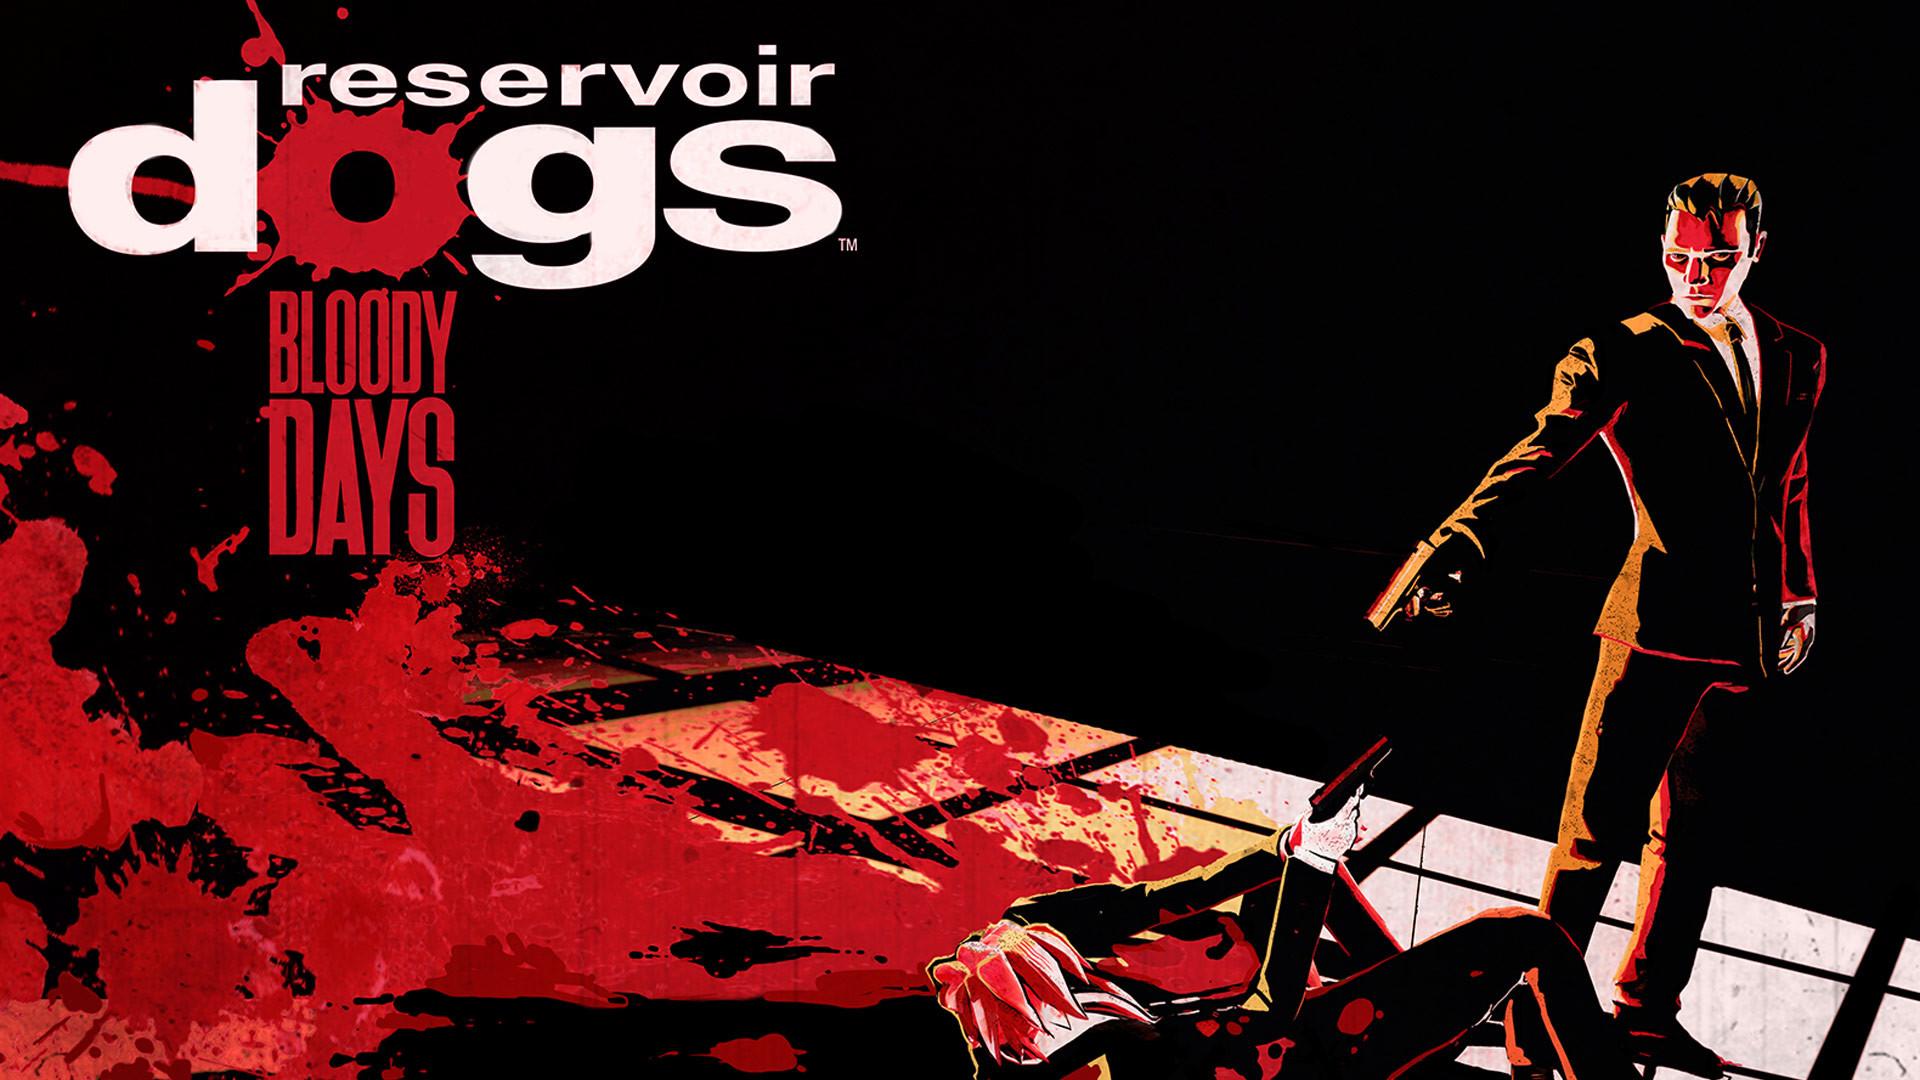 Reservoir Dogs Bloody Days Title Art